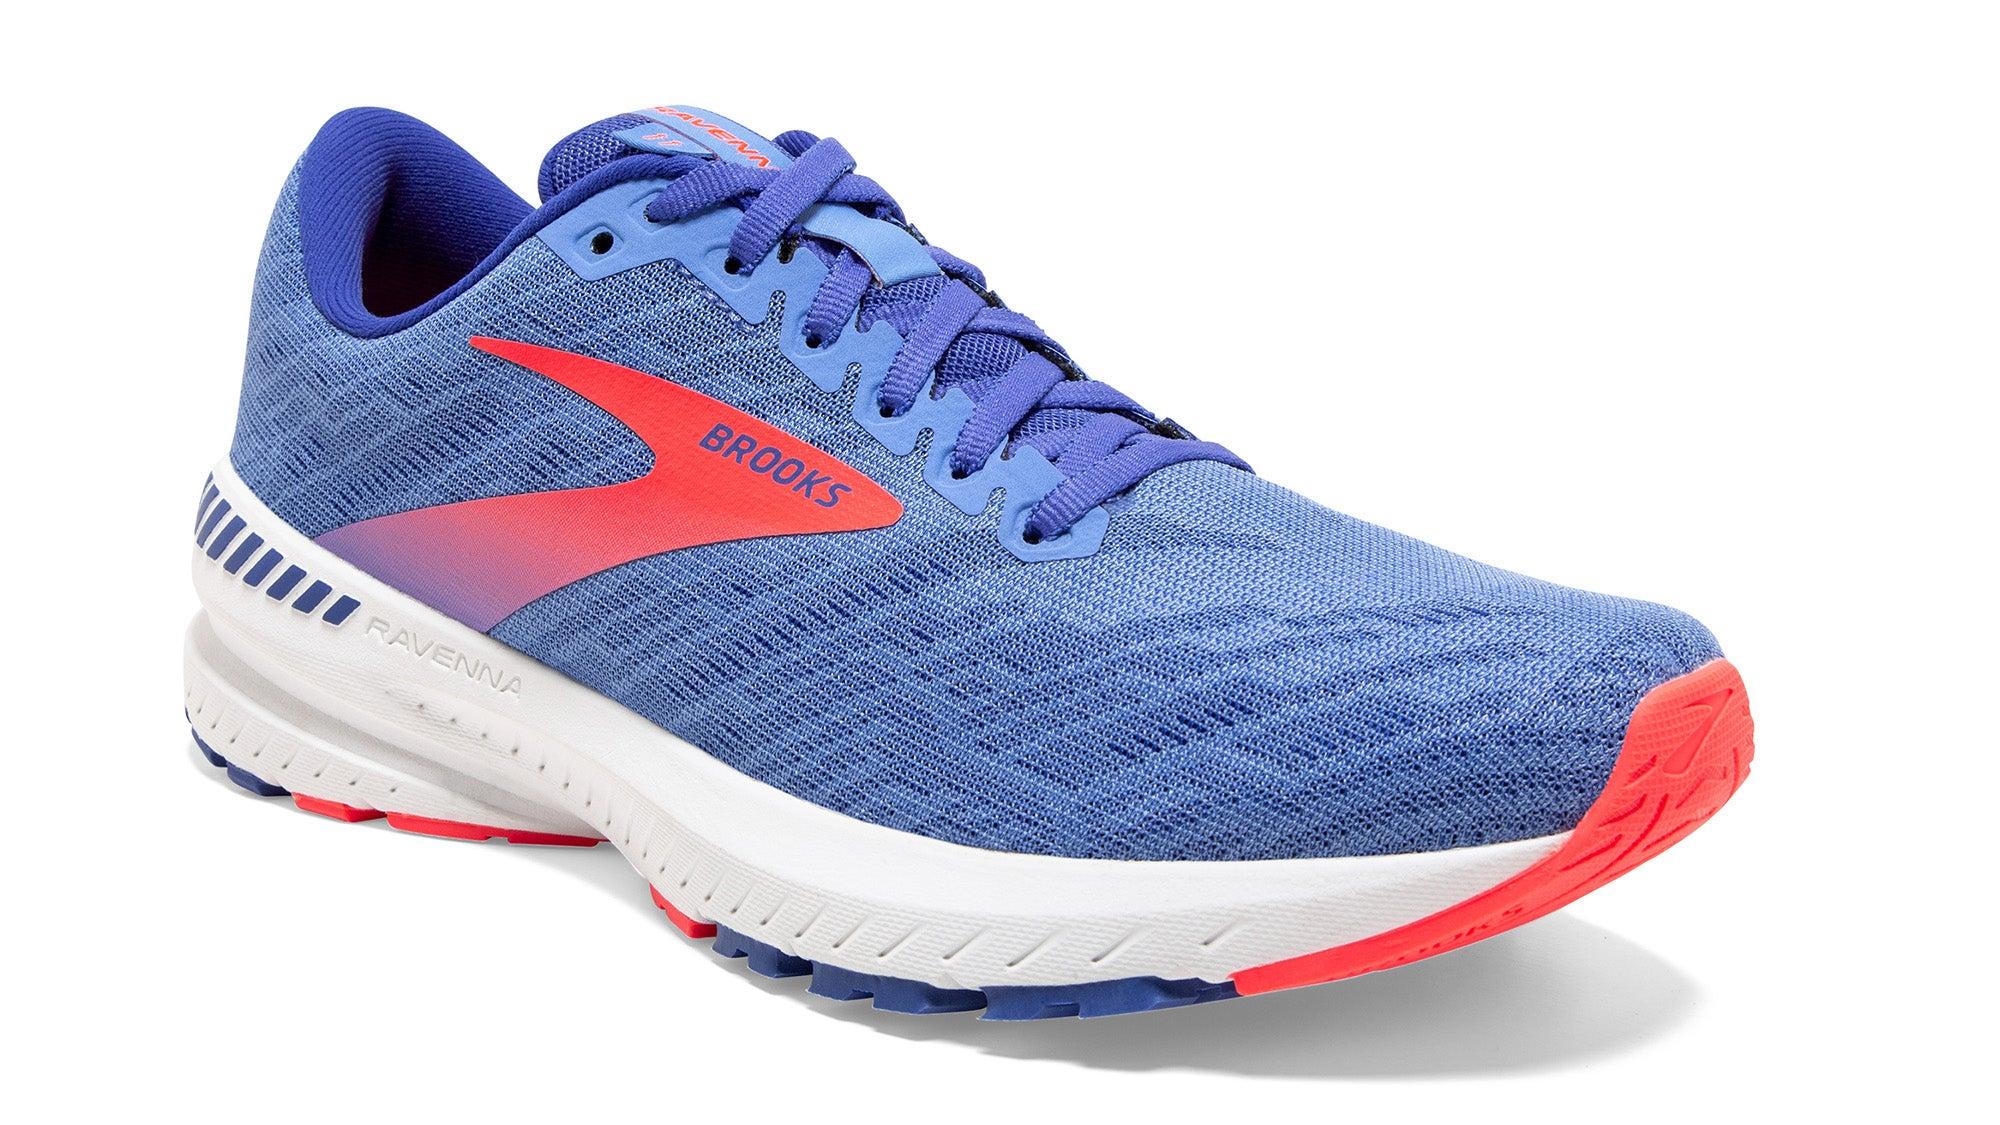 Choosing Your Half Marathon Racing Shoe